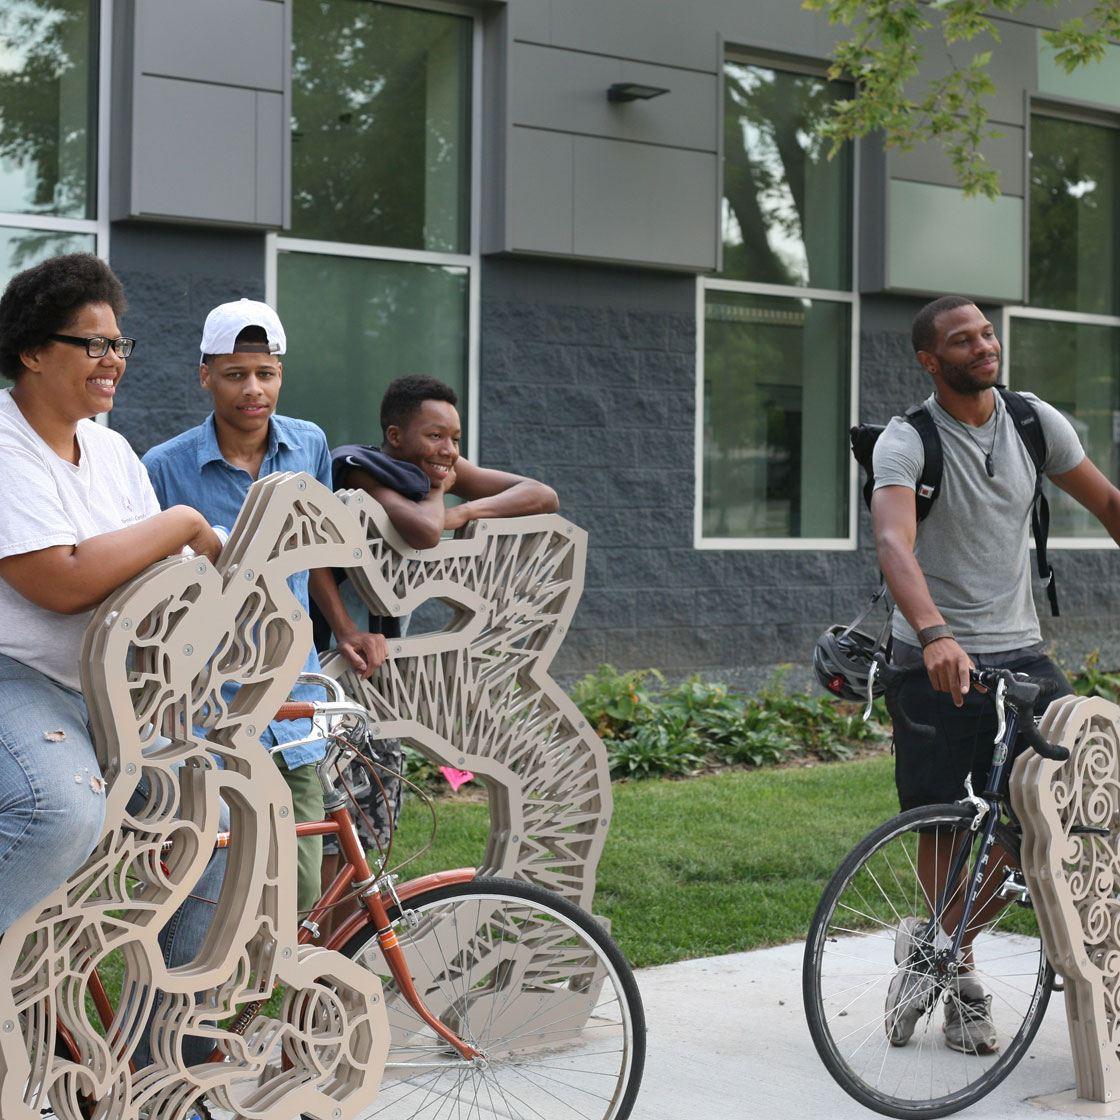 People posing with bike racks in the shape of illustrative break dancers